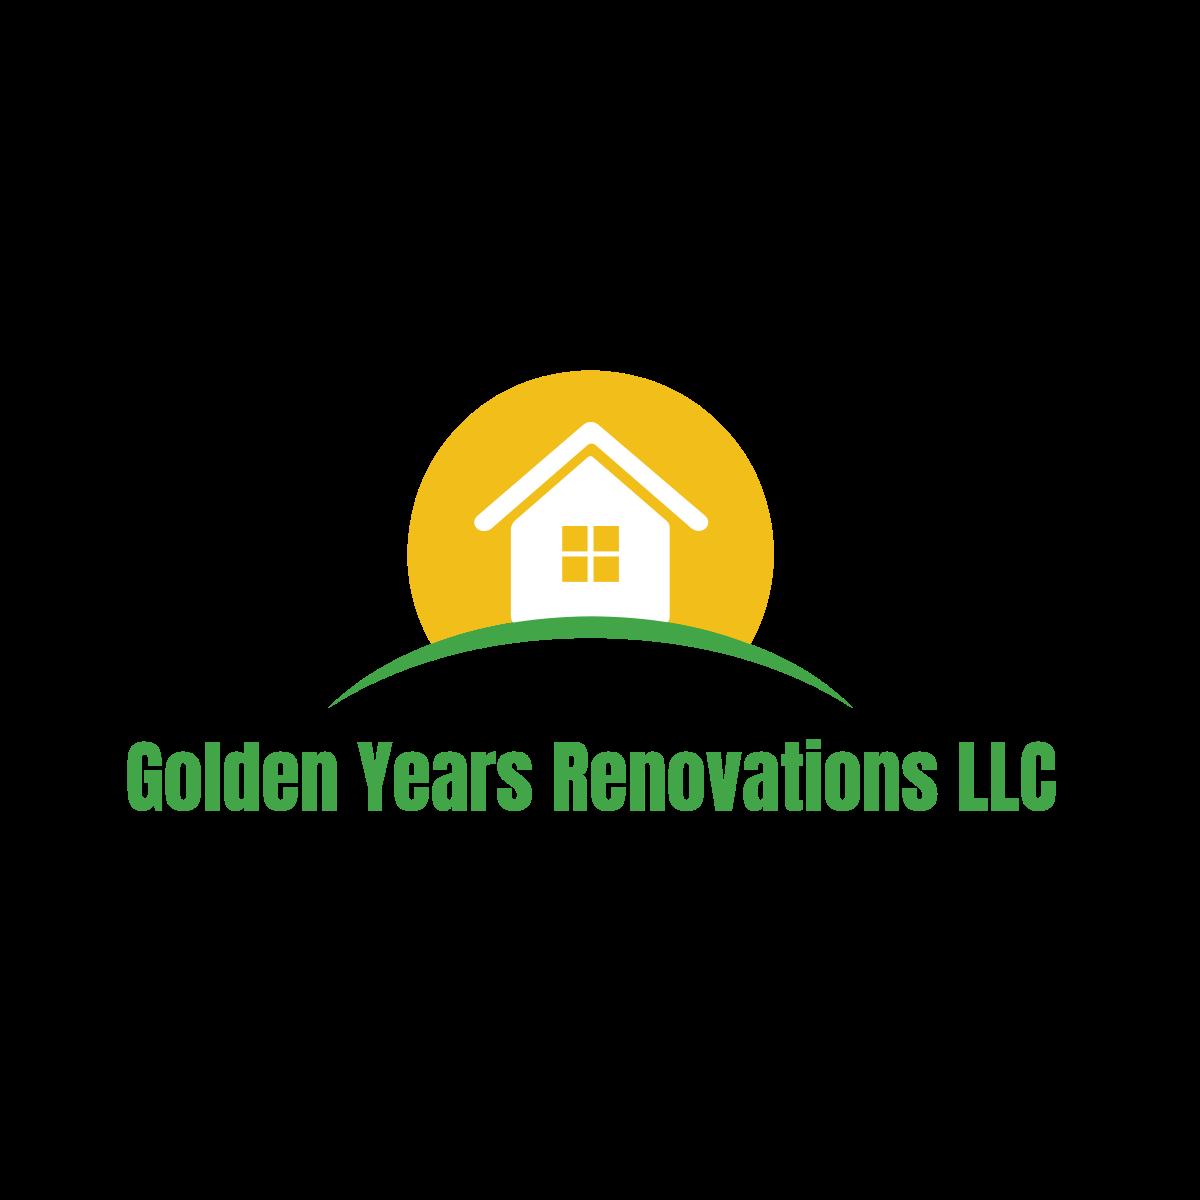 Golden Years Renovations LLC image